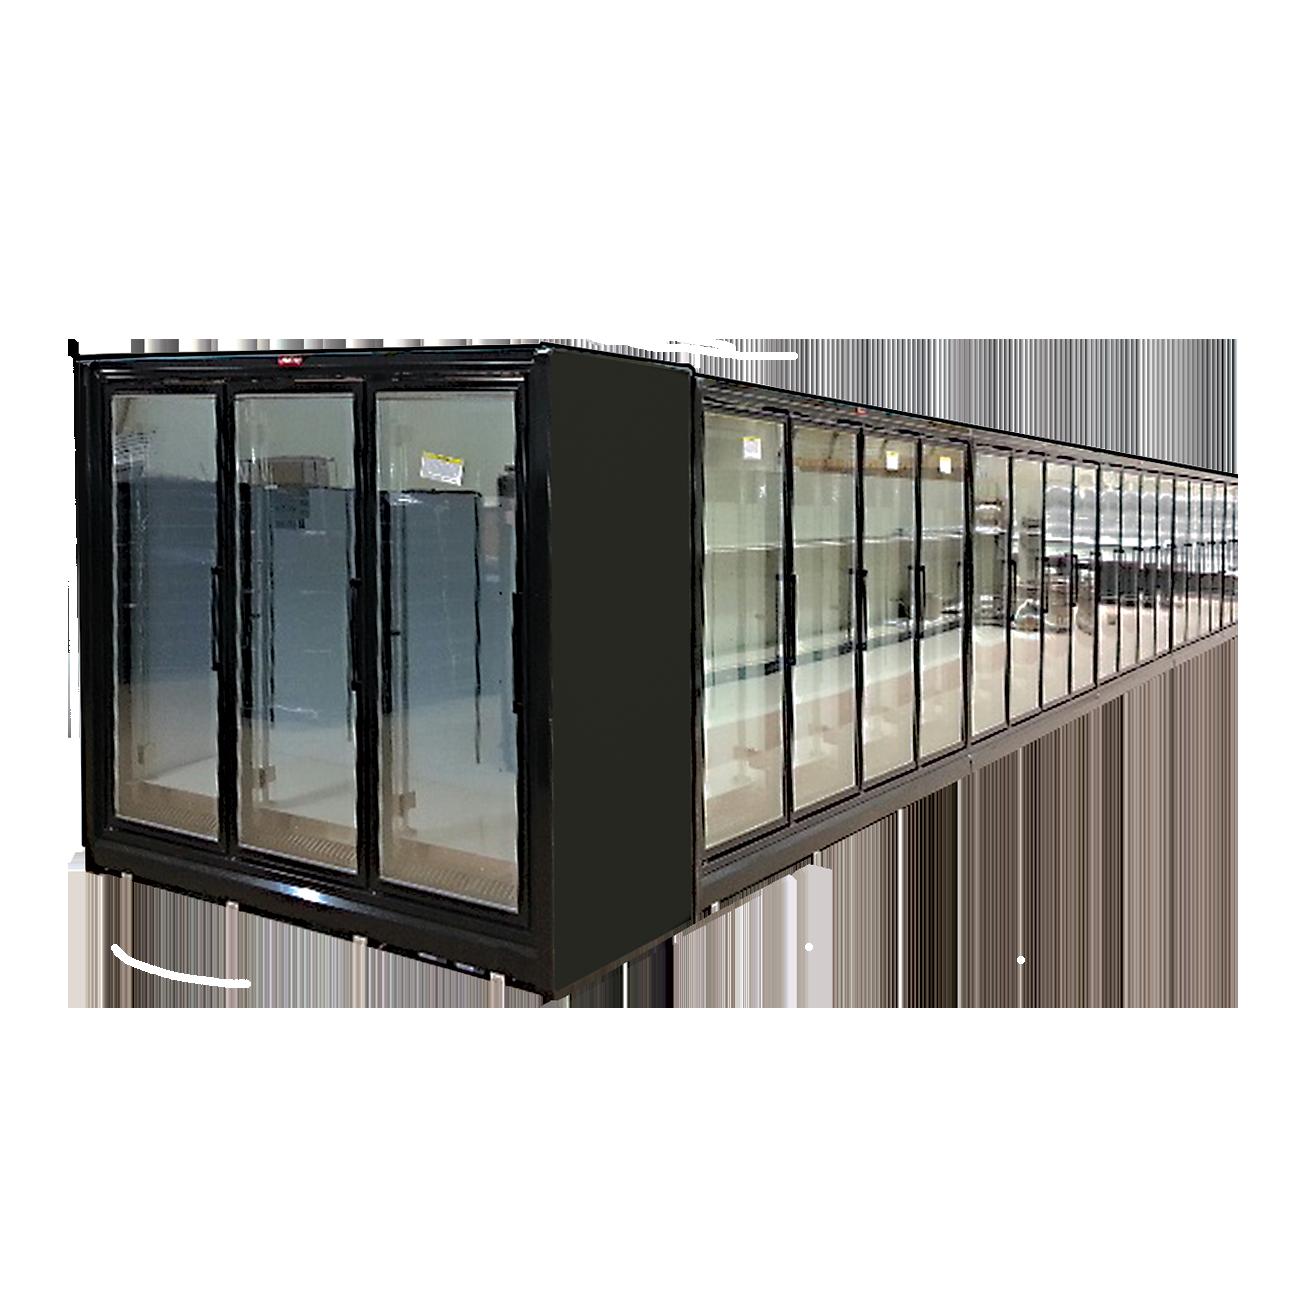 Howard-McCray RIN5-30-LED-B refrigerator, merchandiser